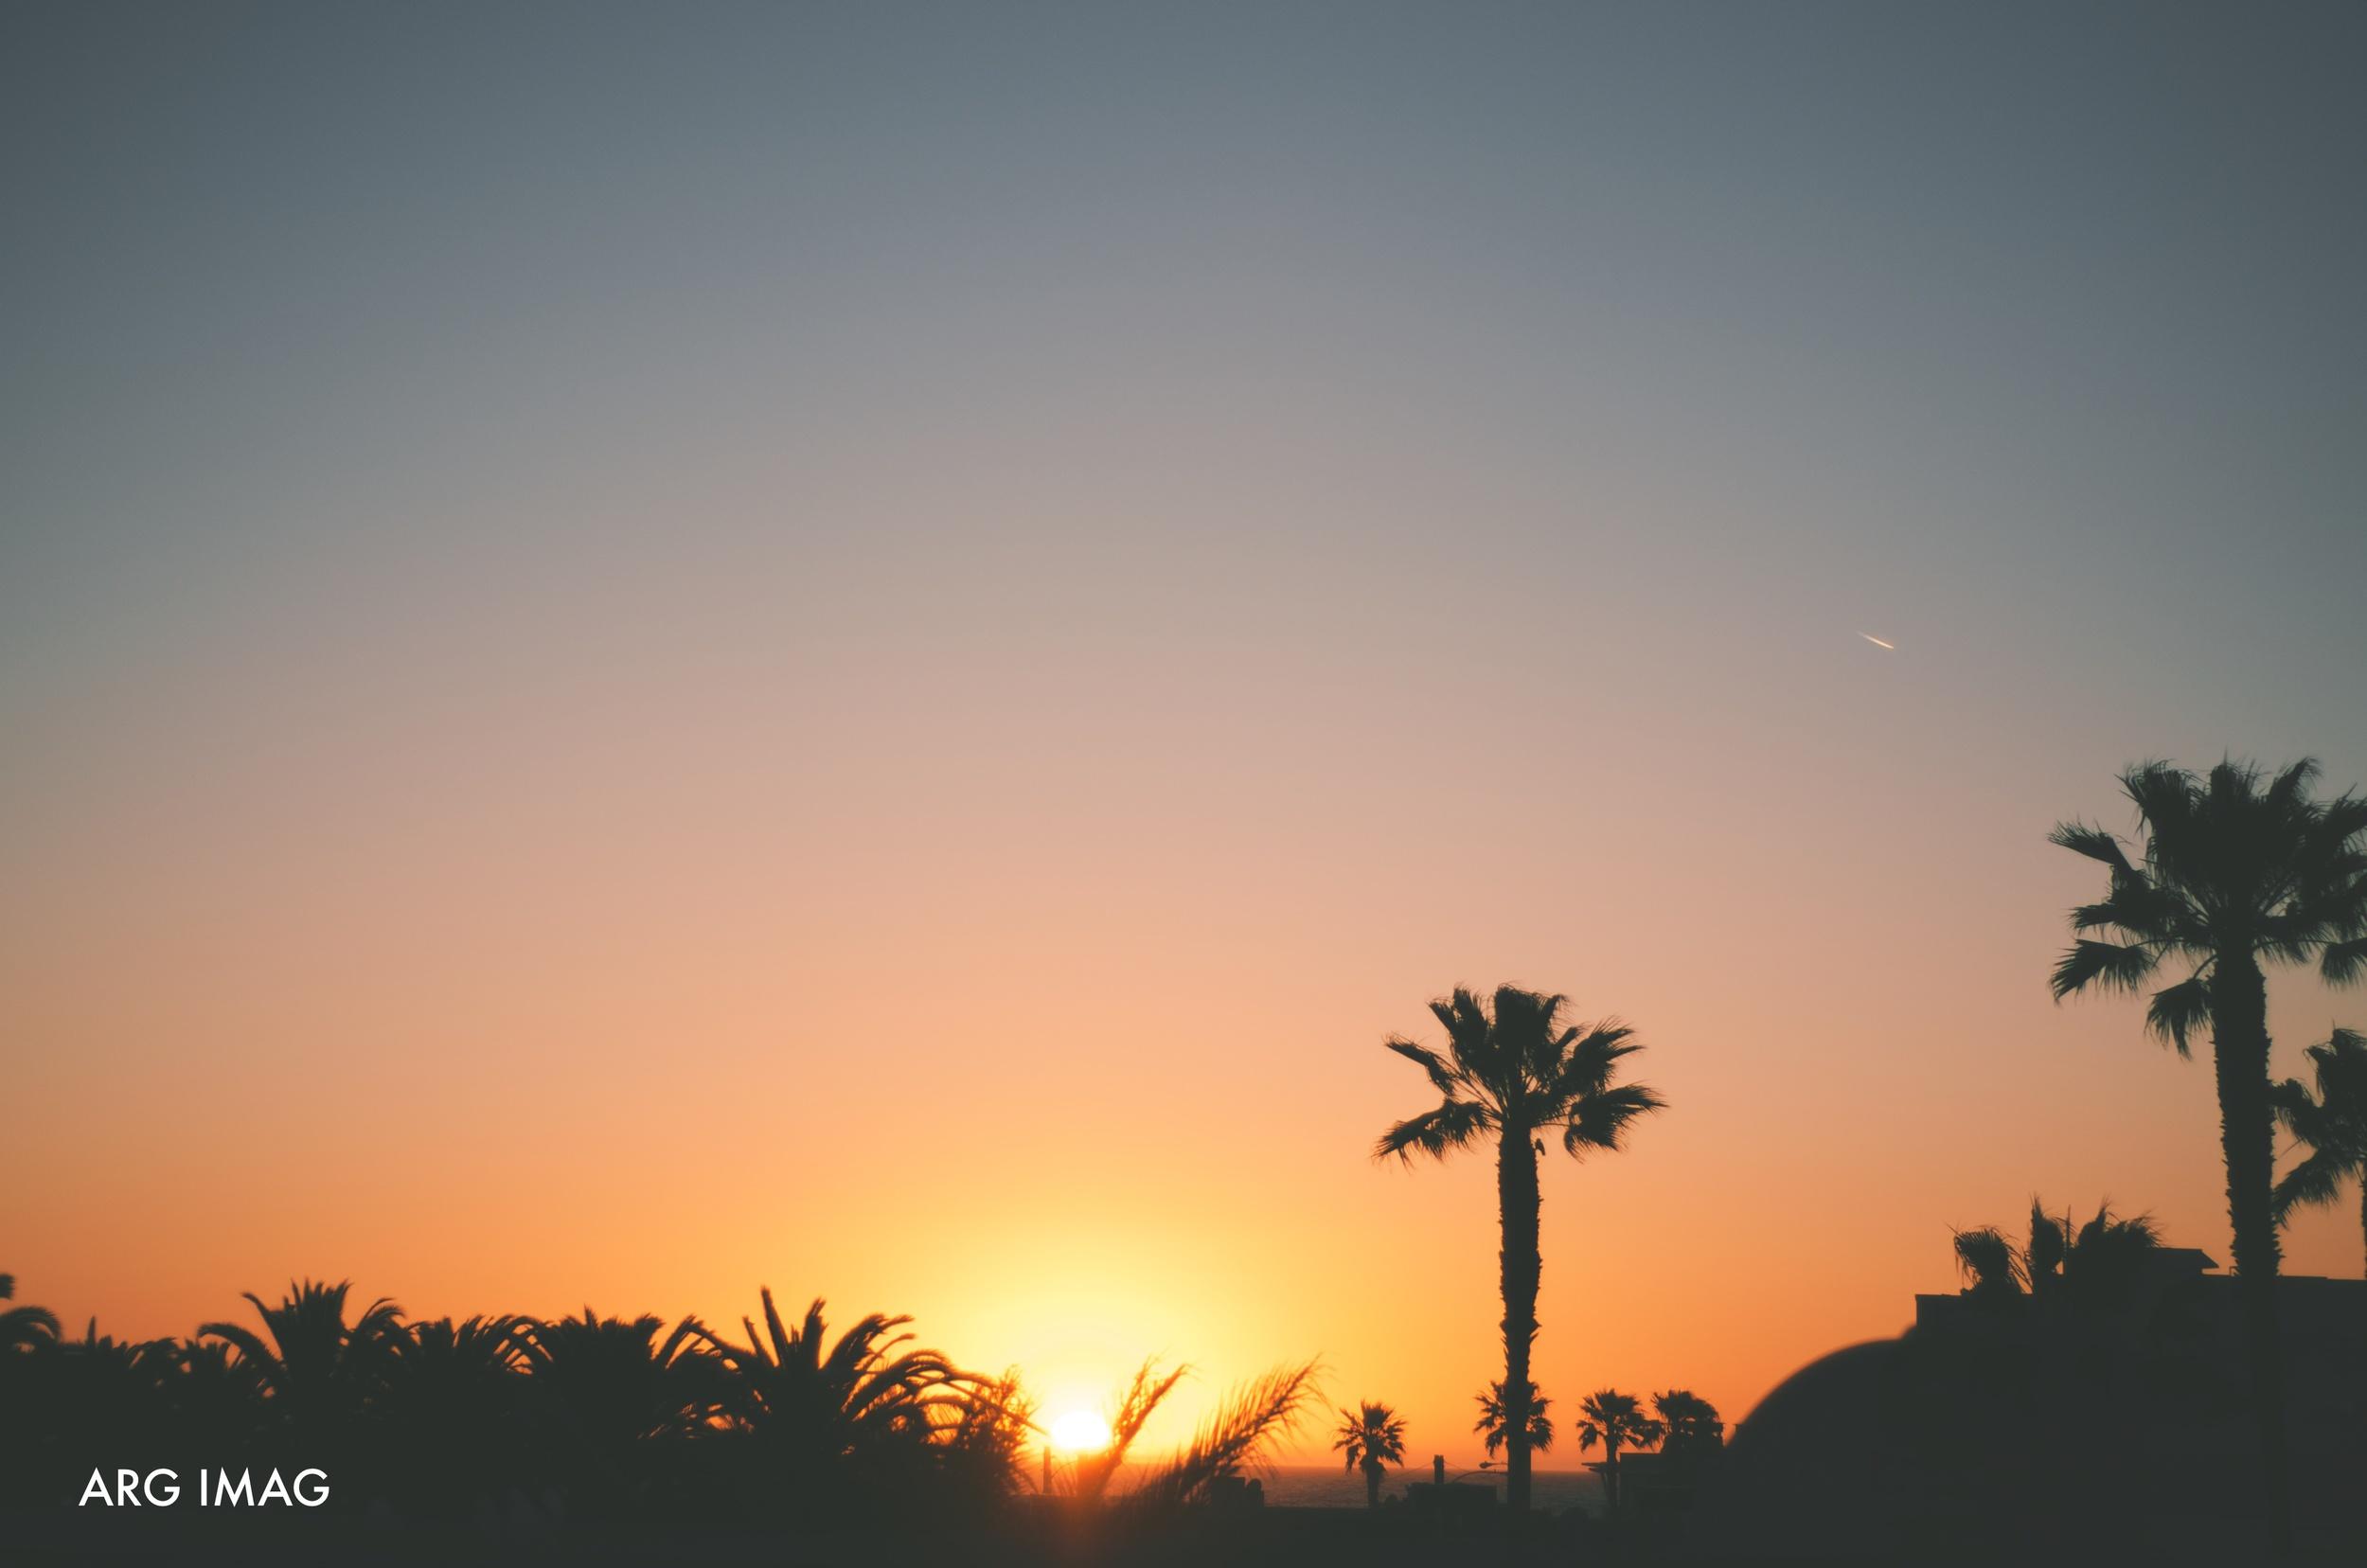 Hermosa Beach, CA | 4/10/13